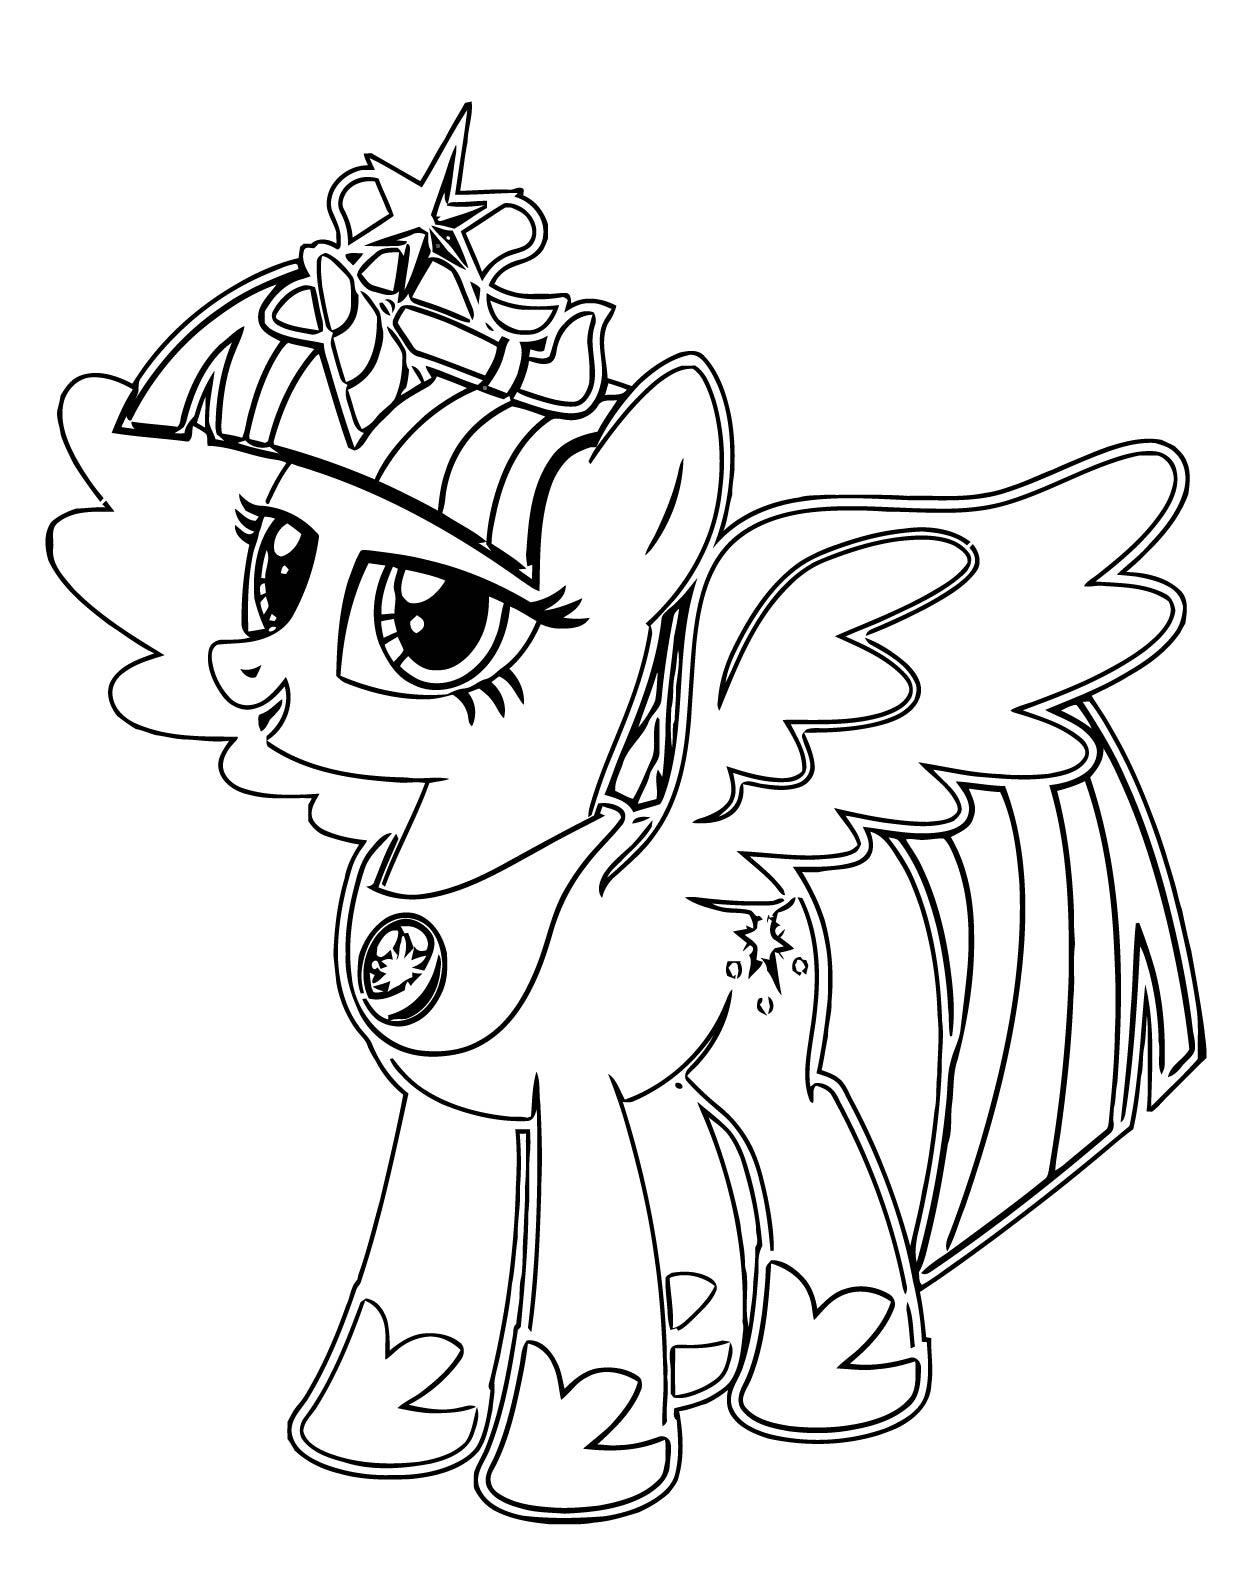 Princess Twilight Sparkle Coloring Page 267